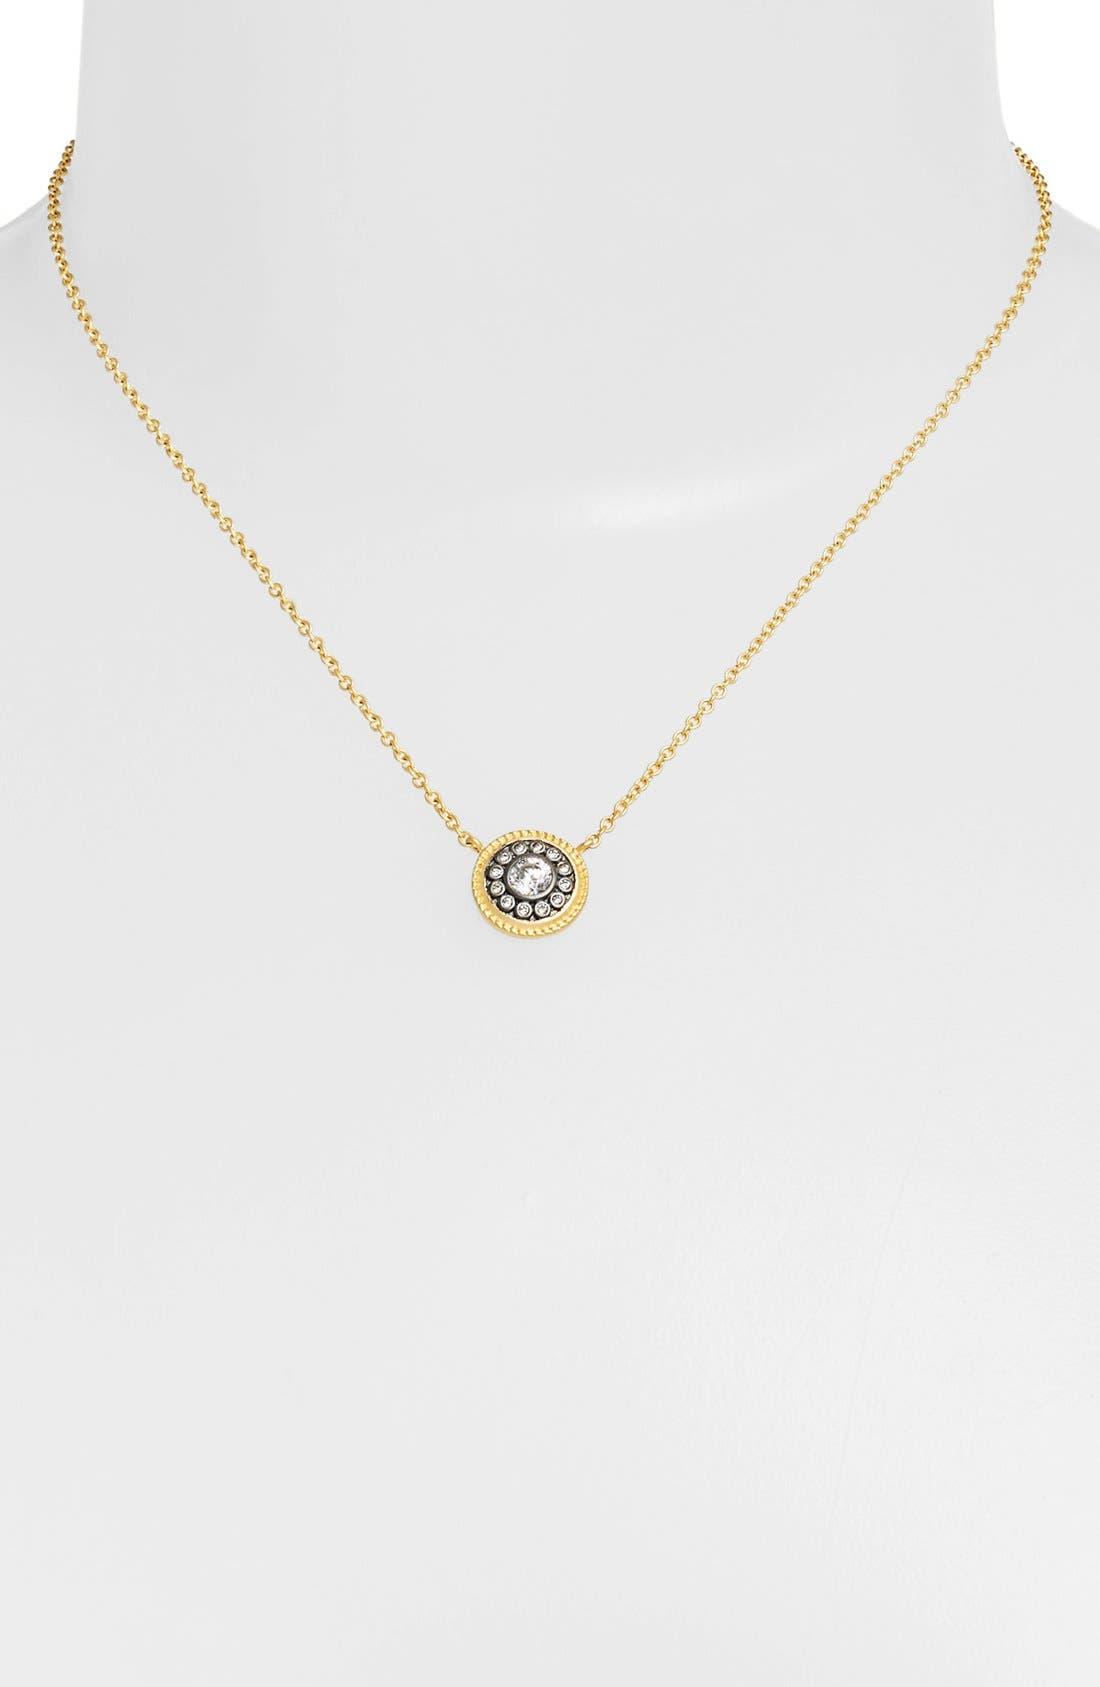 'Hamptons' Nautical Button Pendant Necklace,                             Alternate thumbnail 4, color,                             GOLD/ GUNMETAL